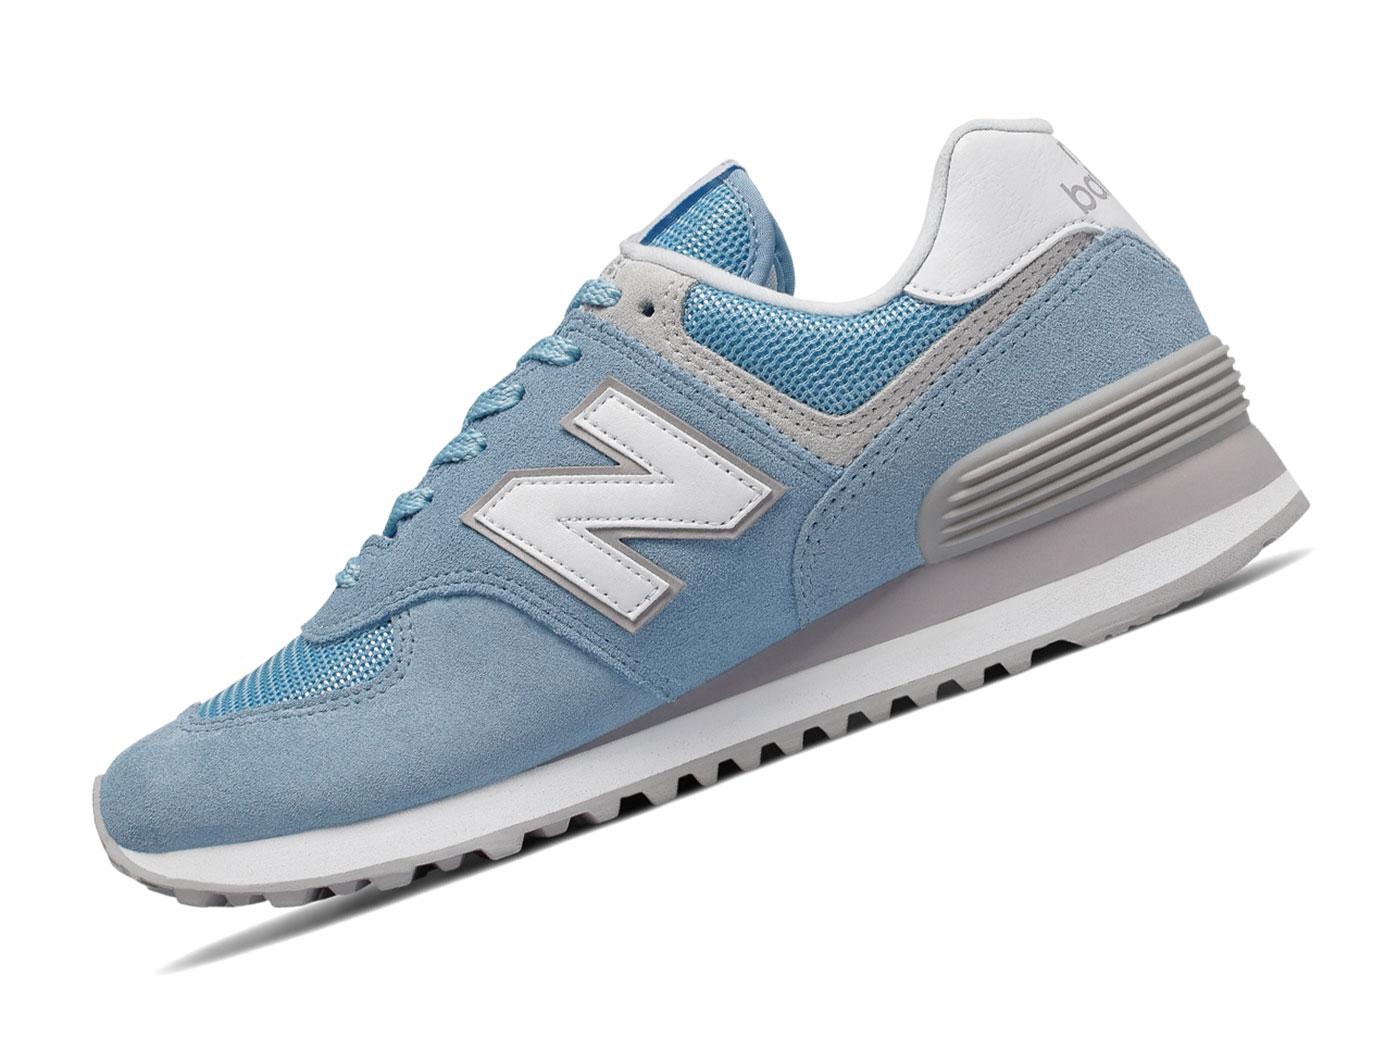 New Balance Wl574esb Damen 38 Blau rjugleRvC3